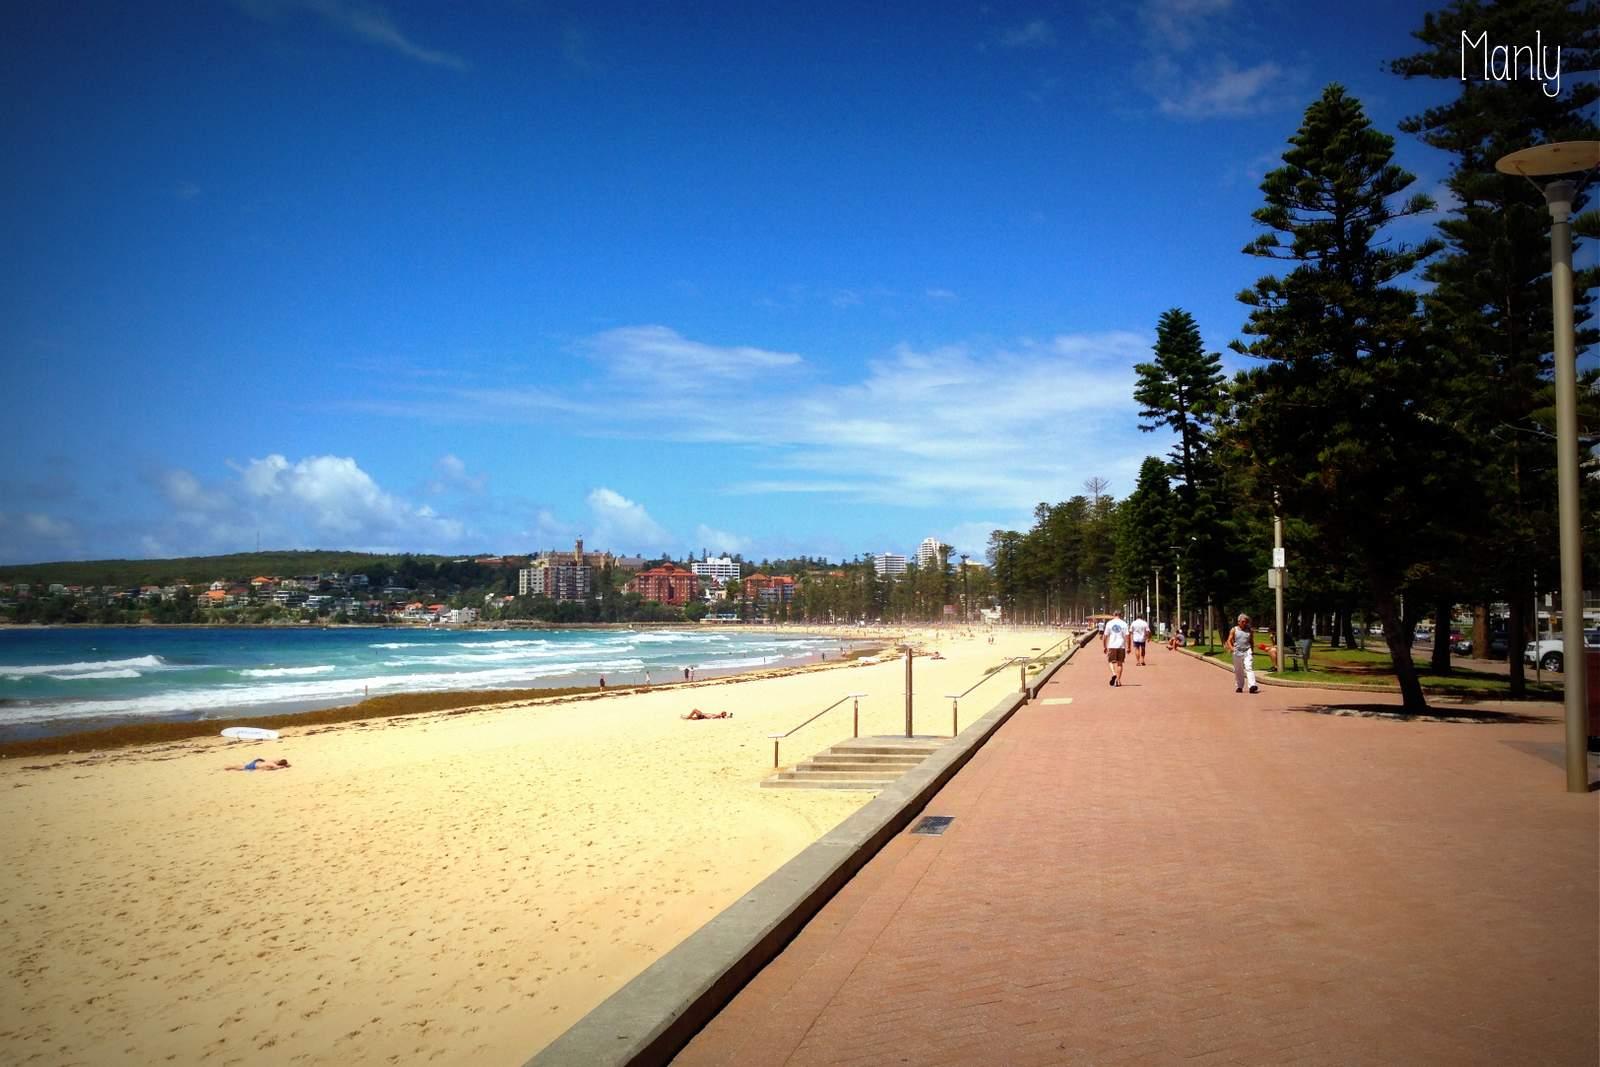 Praia de Sydney na Austrália, manly beach